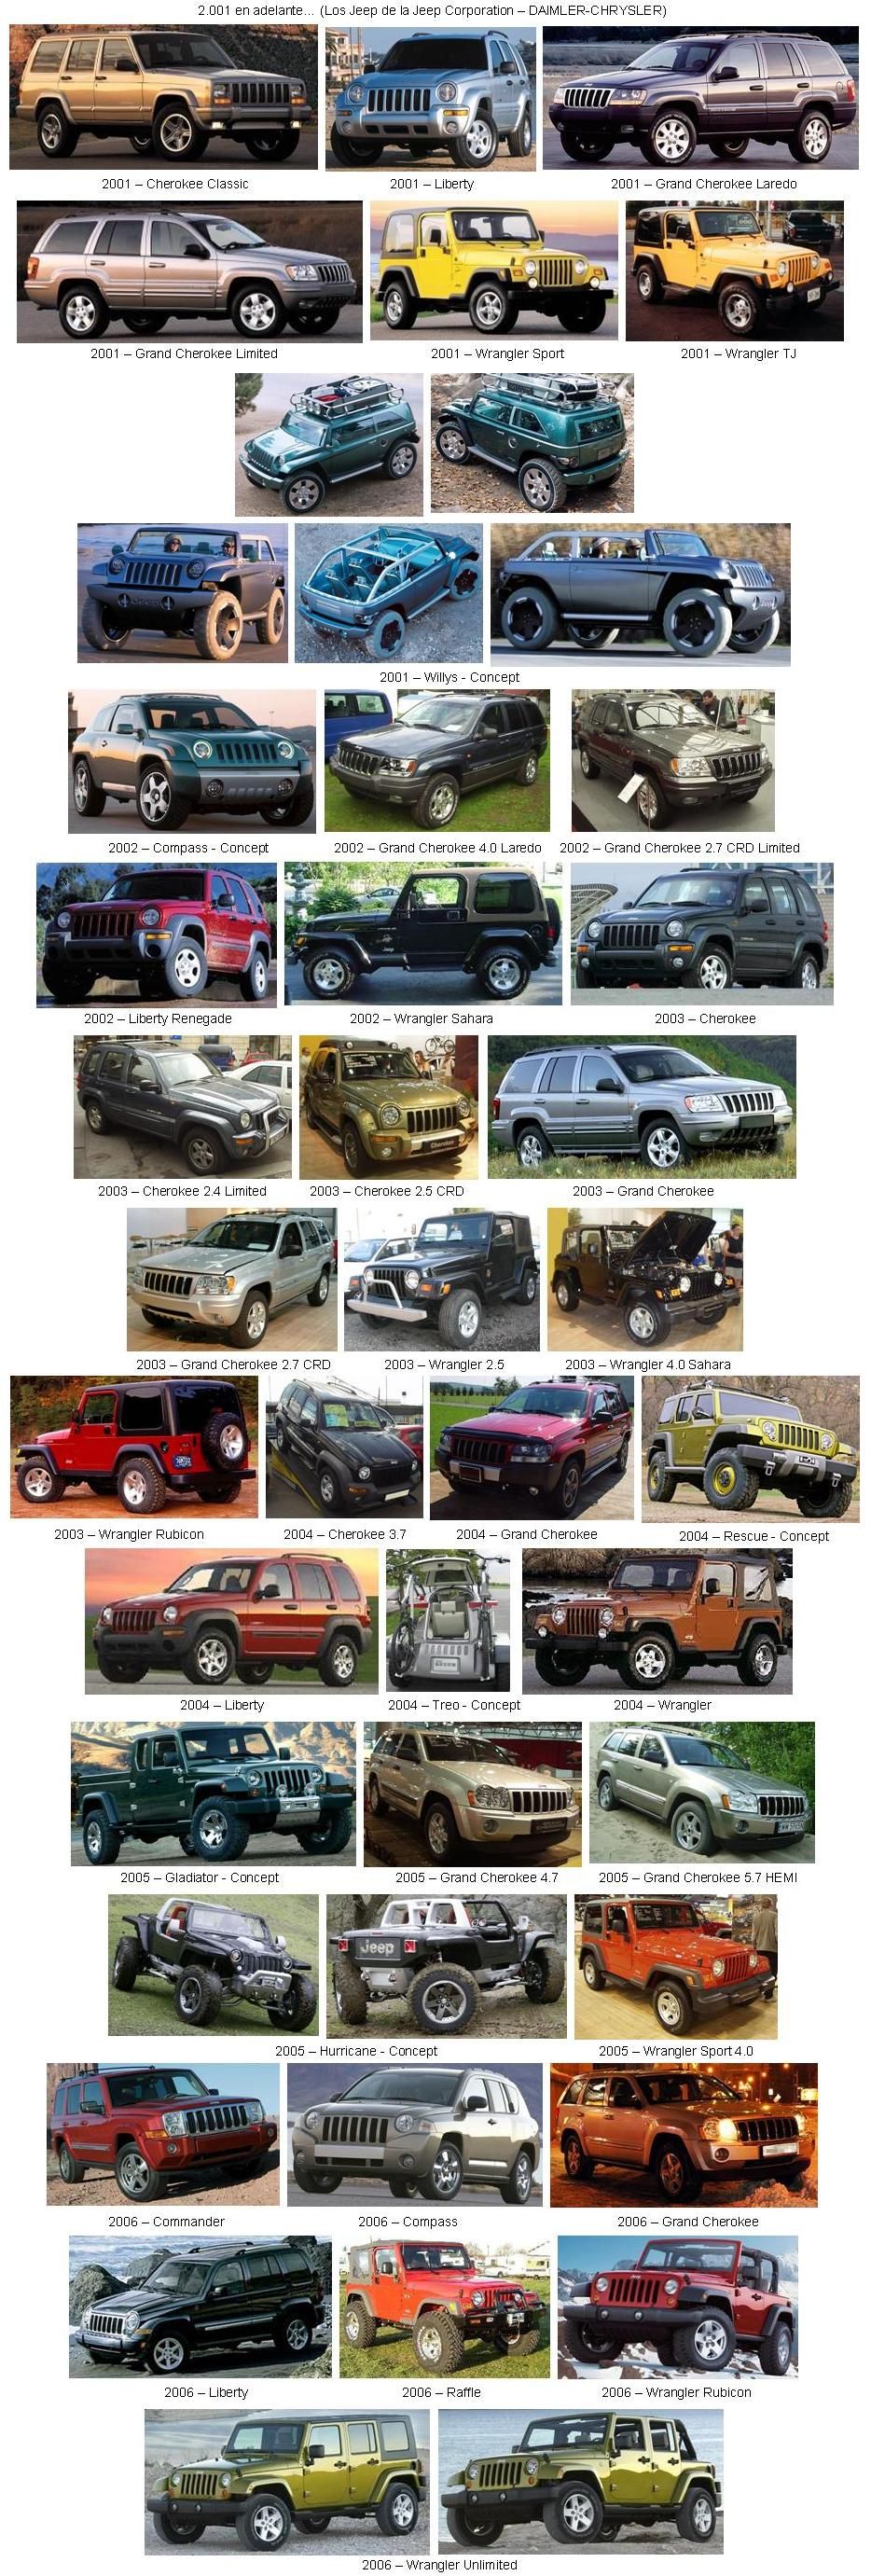 Historia Gráfica de la Jeep JEEP-08-(2001%20en%20adelante)-(Jeep%20Corporation%20-%20Daimler-Chrysler)